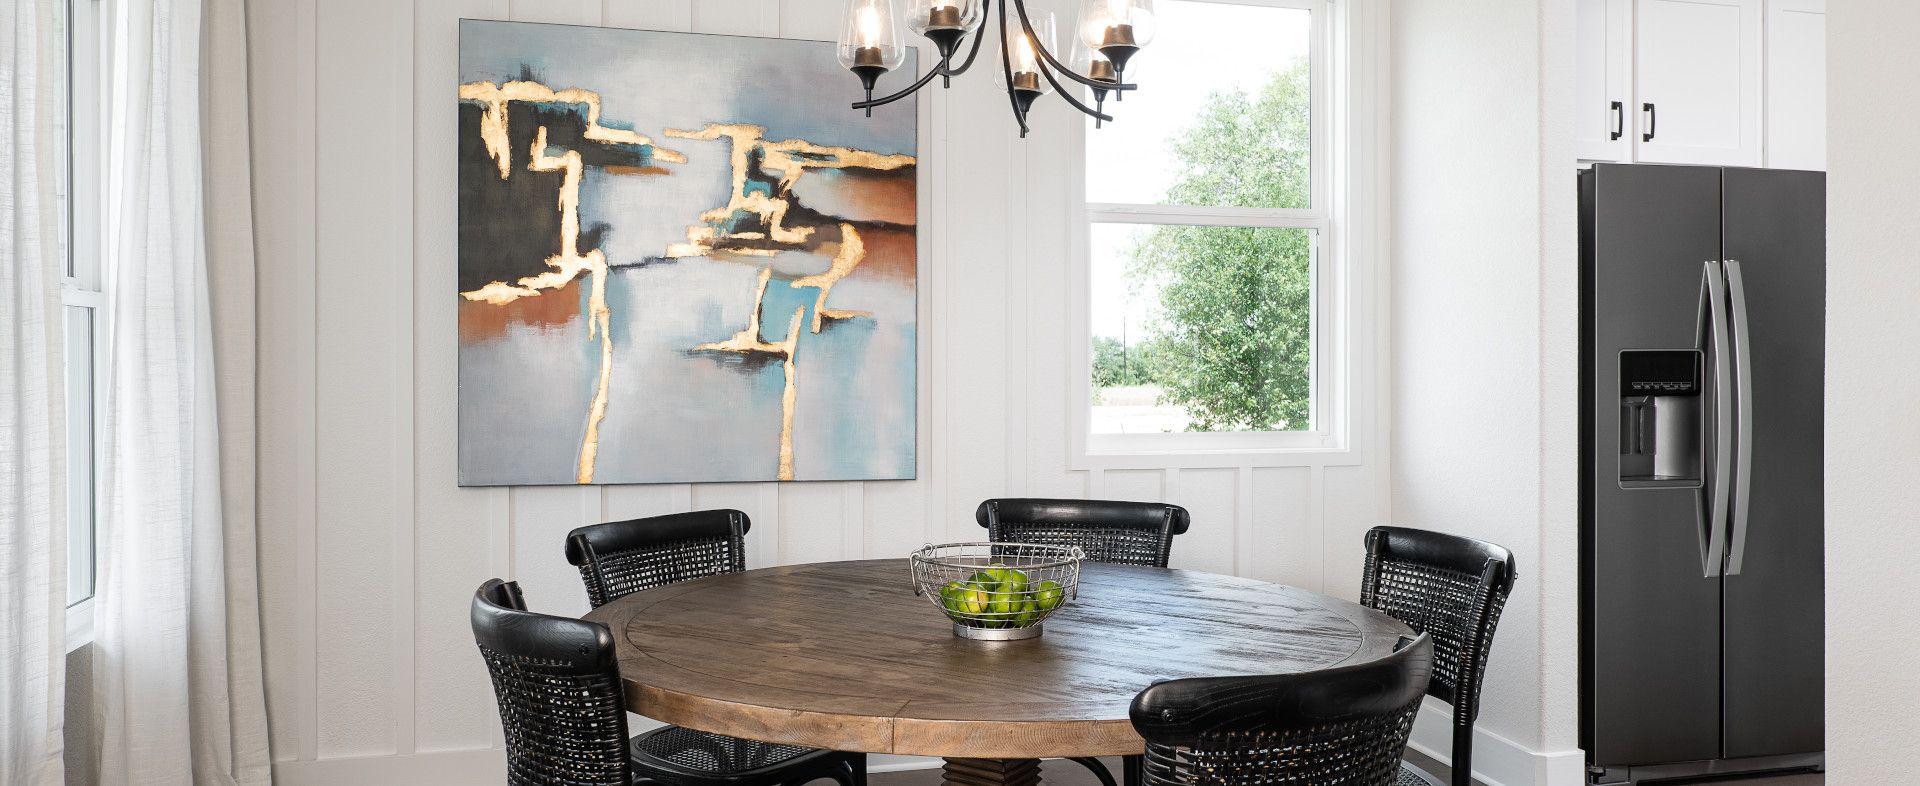 'Mockingbird Park Cottages' by Ashton Woods Homes-Austin in Austin